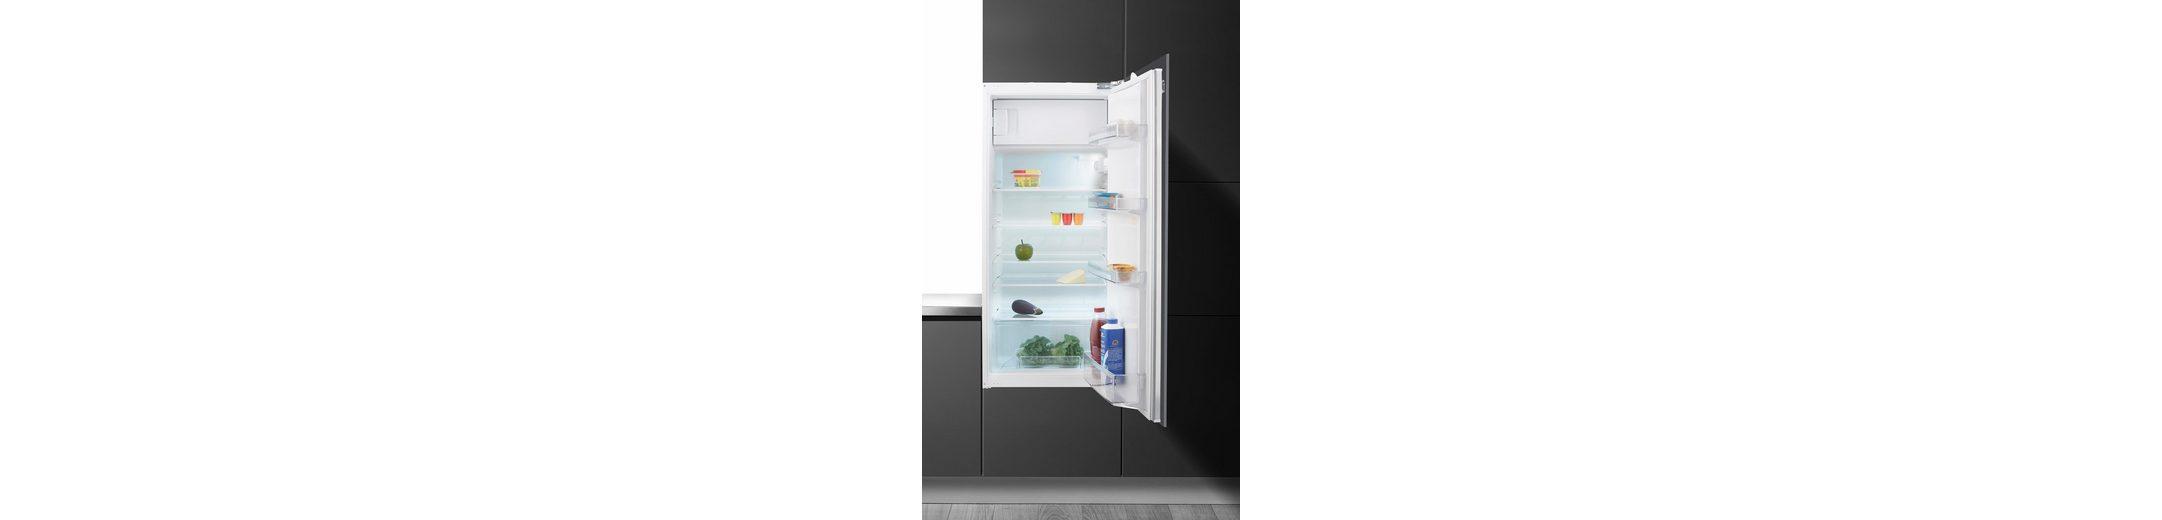 Siemens integrierbarer Einbau-Kühlschrank KI24LV52, A+, 122,5 cm